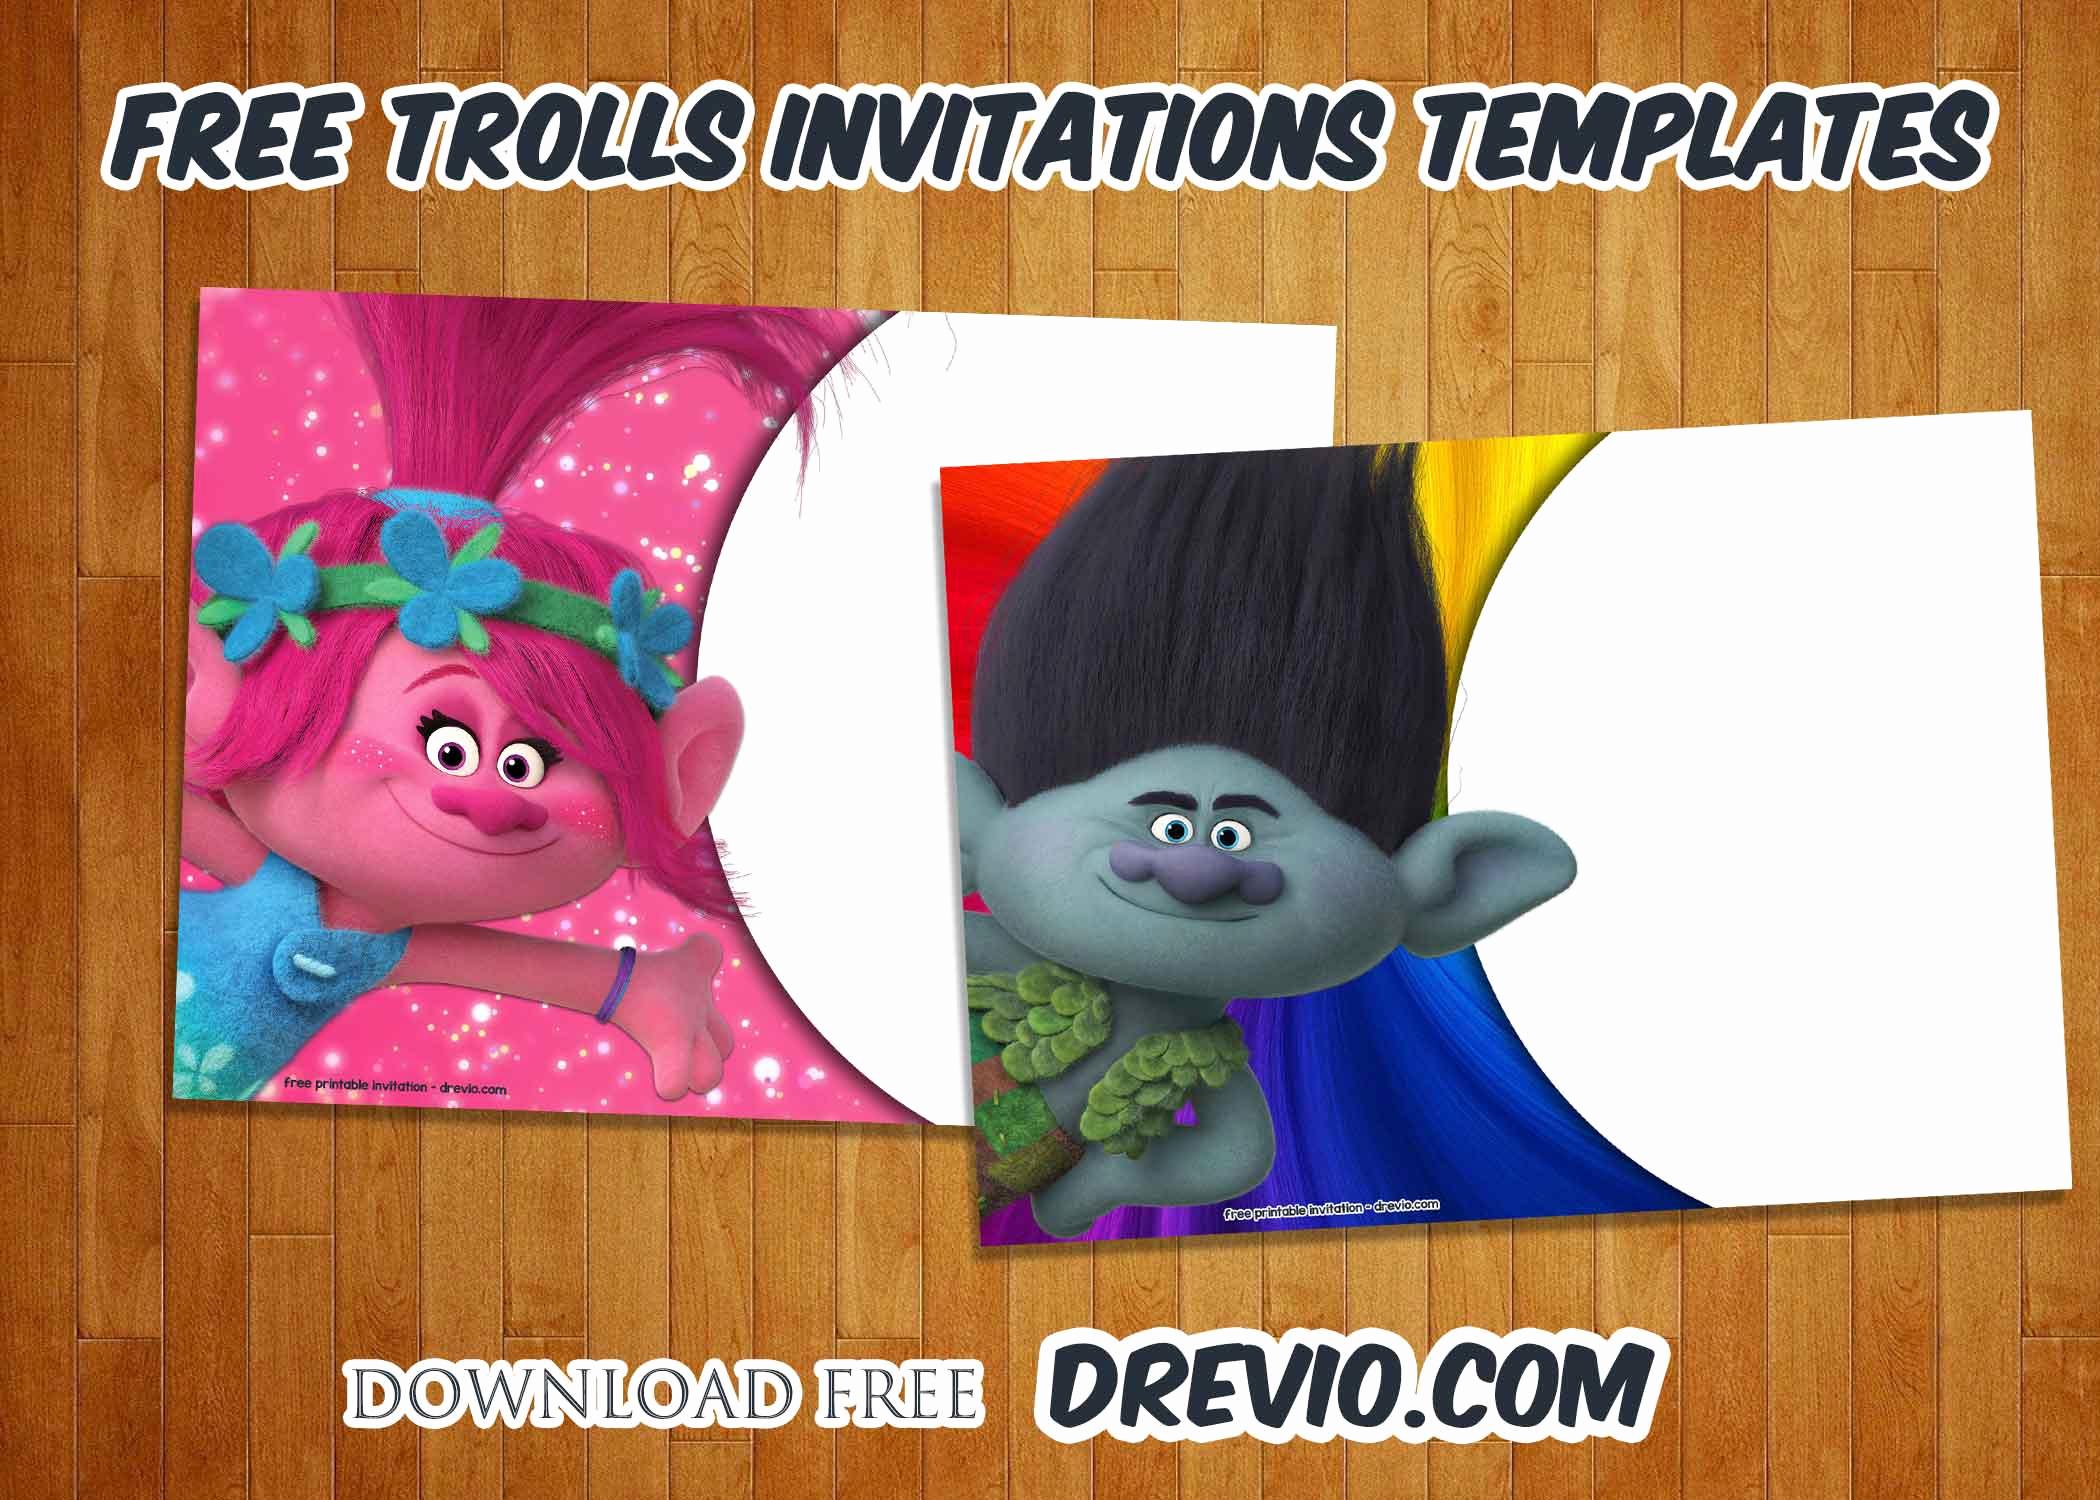 Free Trolls Invitation Template Inspirational Free Trolls Birthday Invitations Templates